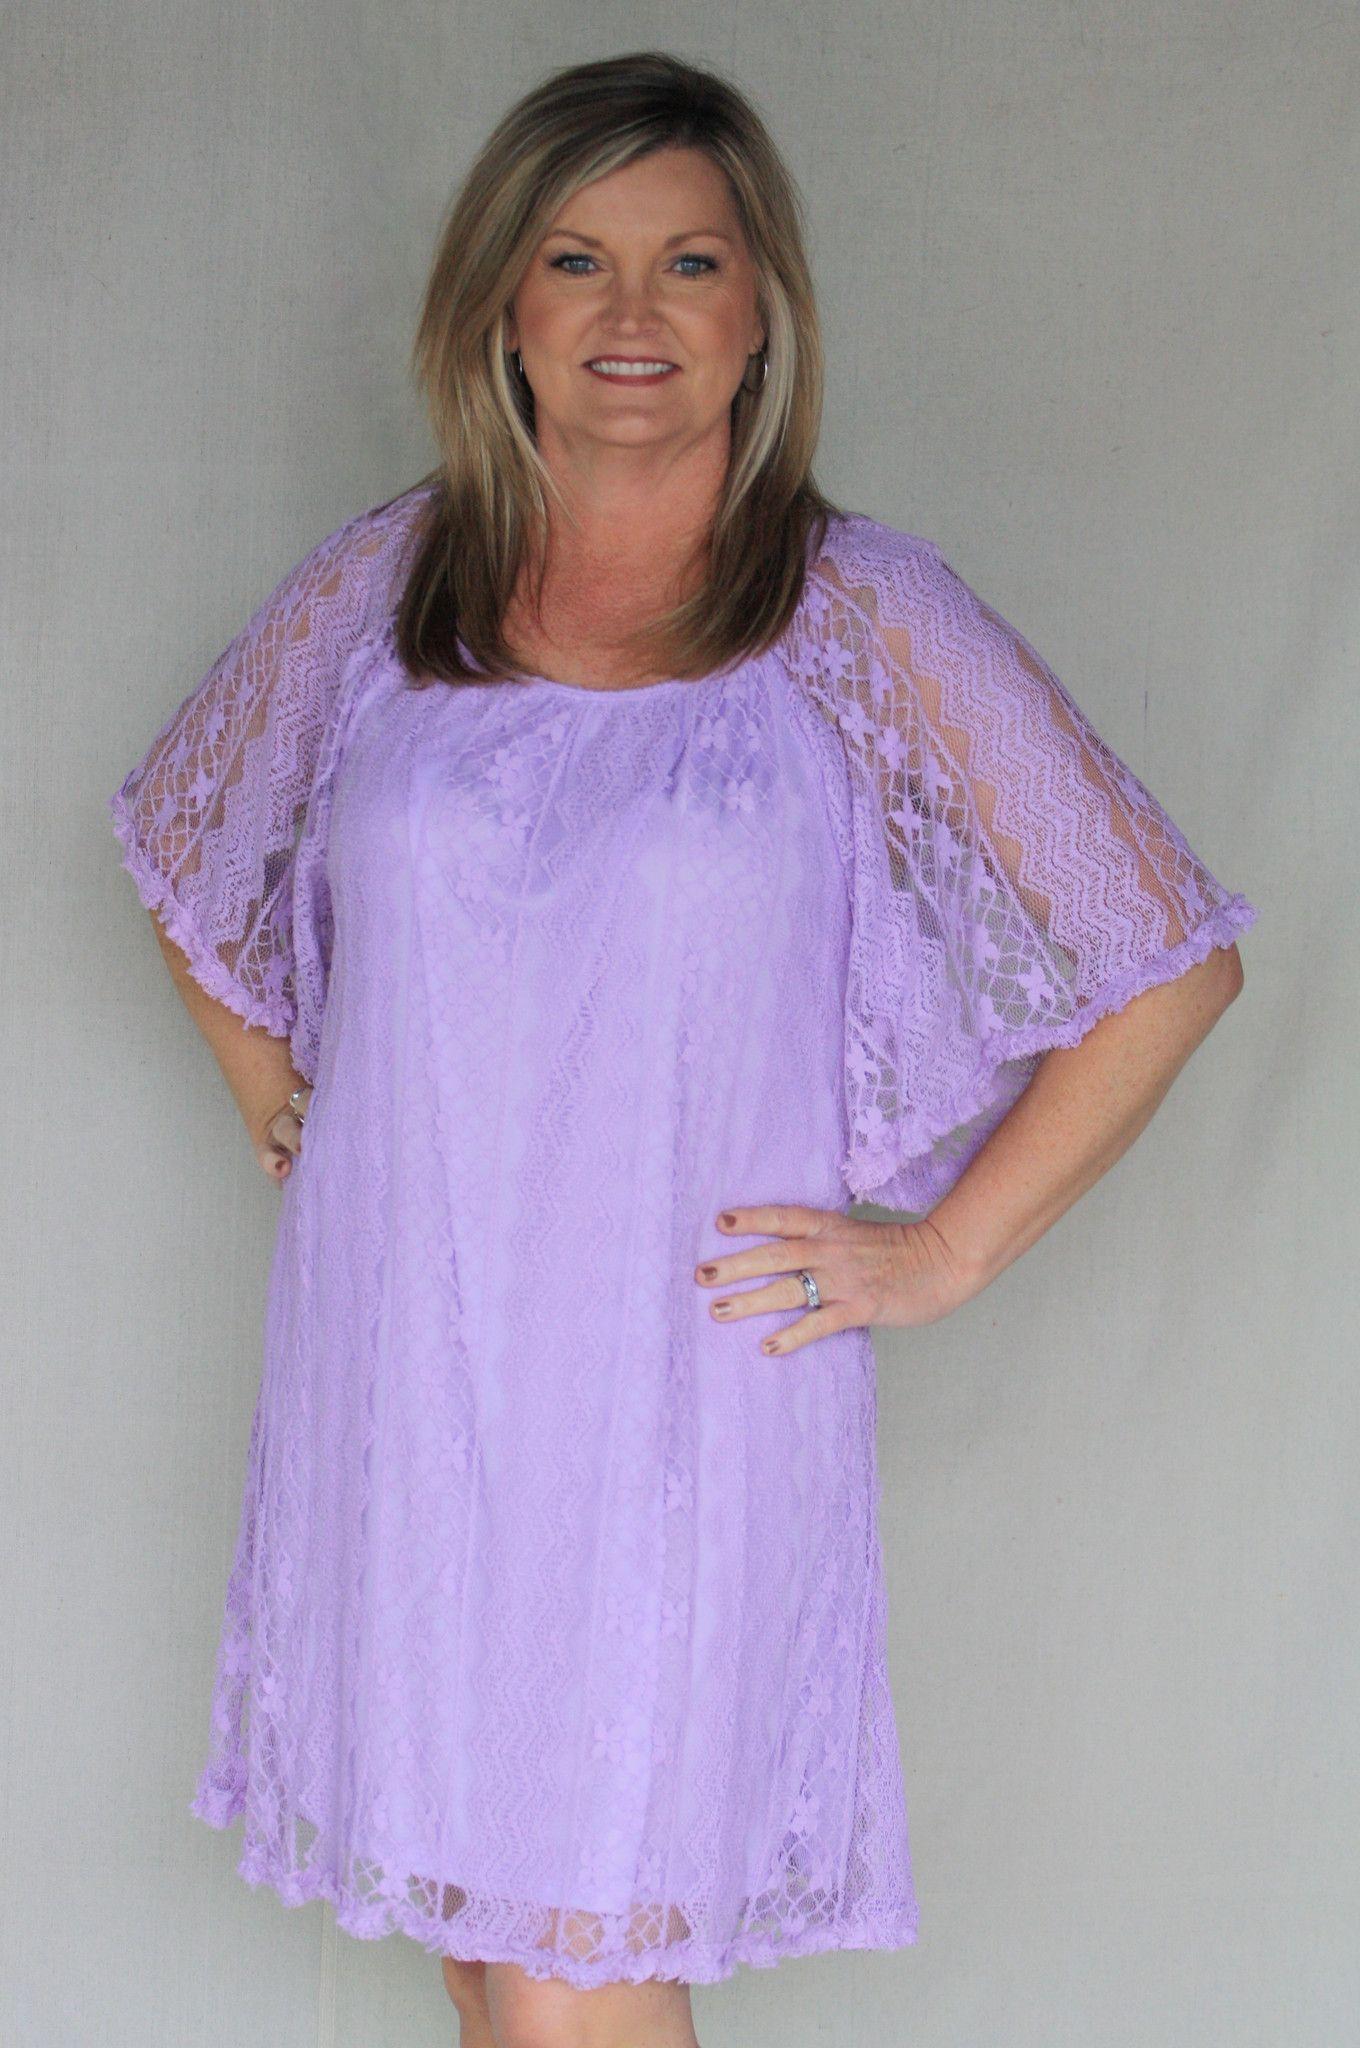 Second marriage wedding dresses plus size  Lavender Dreams Dress CURVY  Products  Pinterest  Dream dress